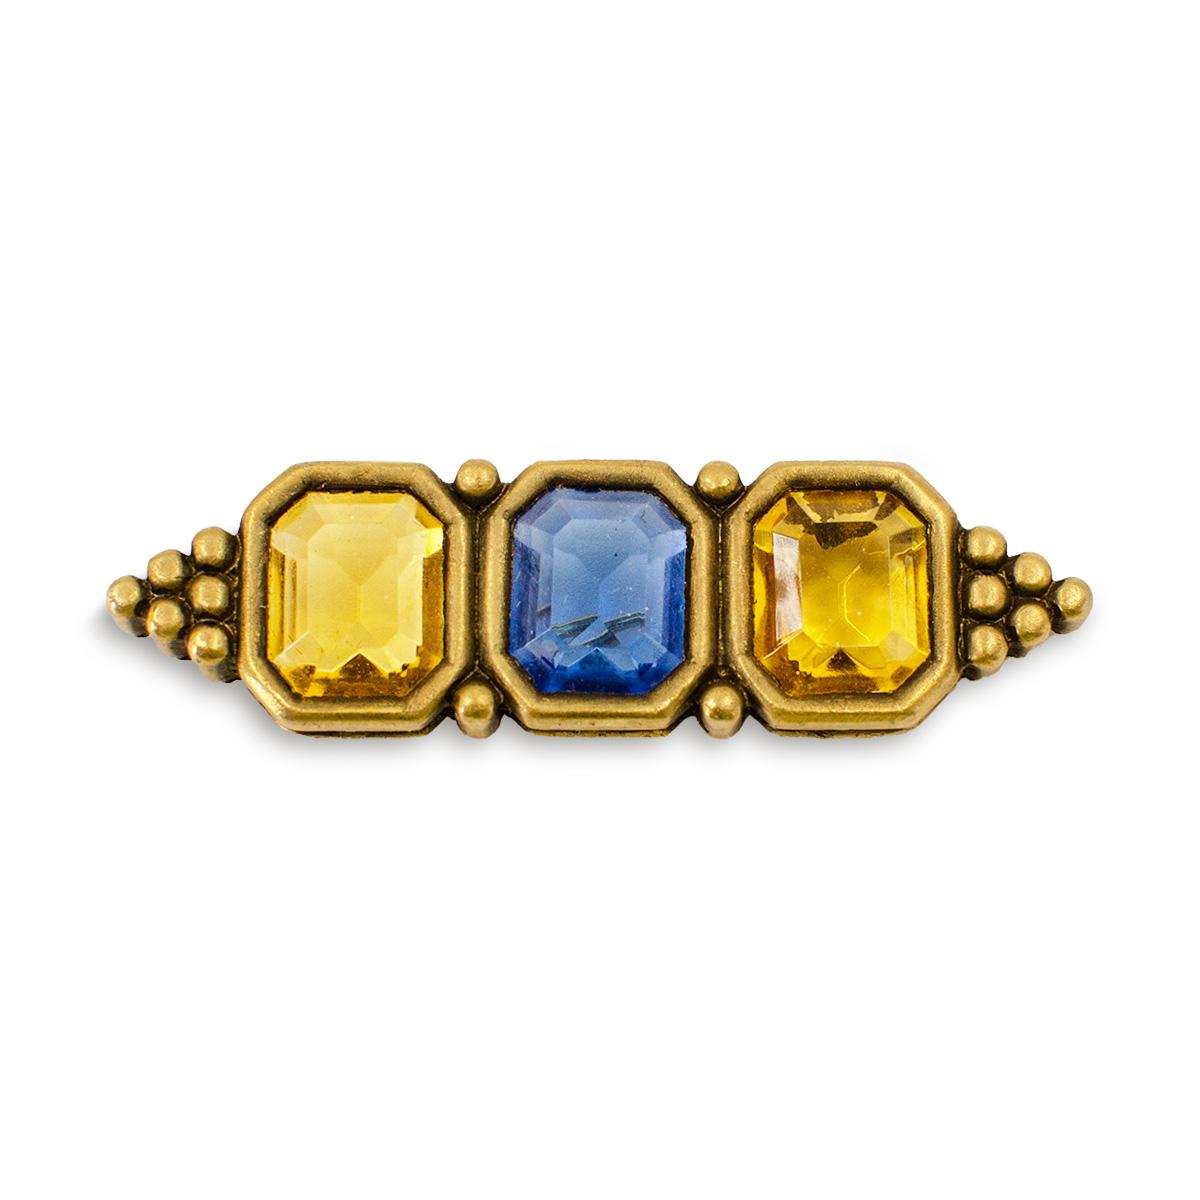 Crystal brooch, ysl bar pin